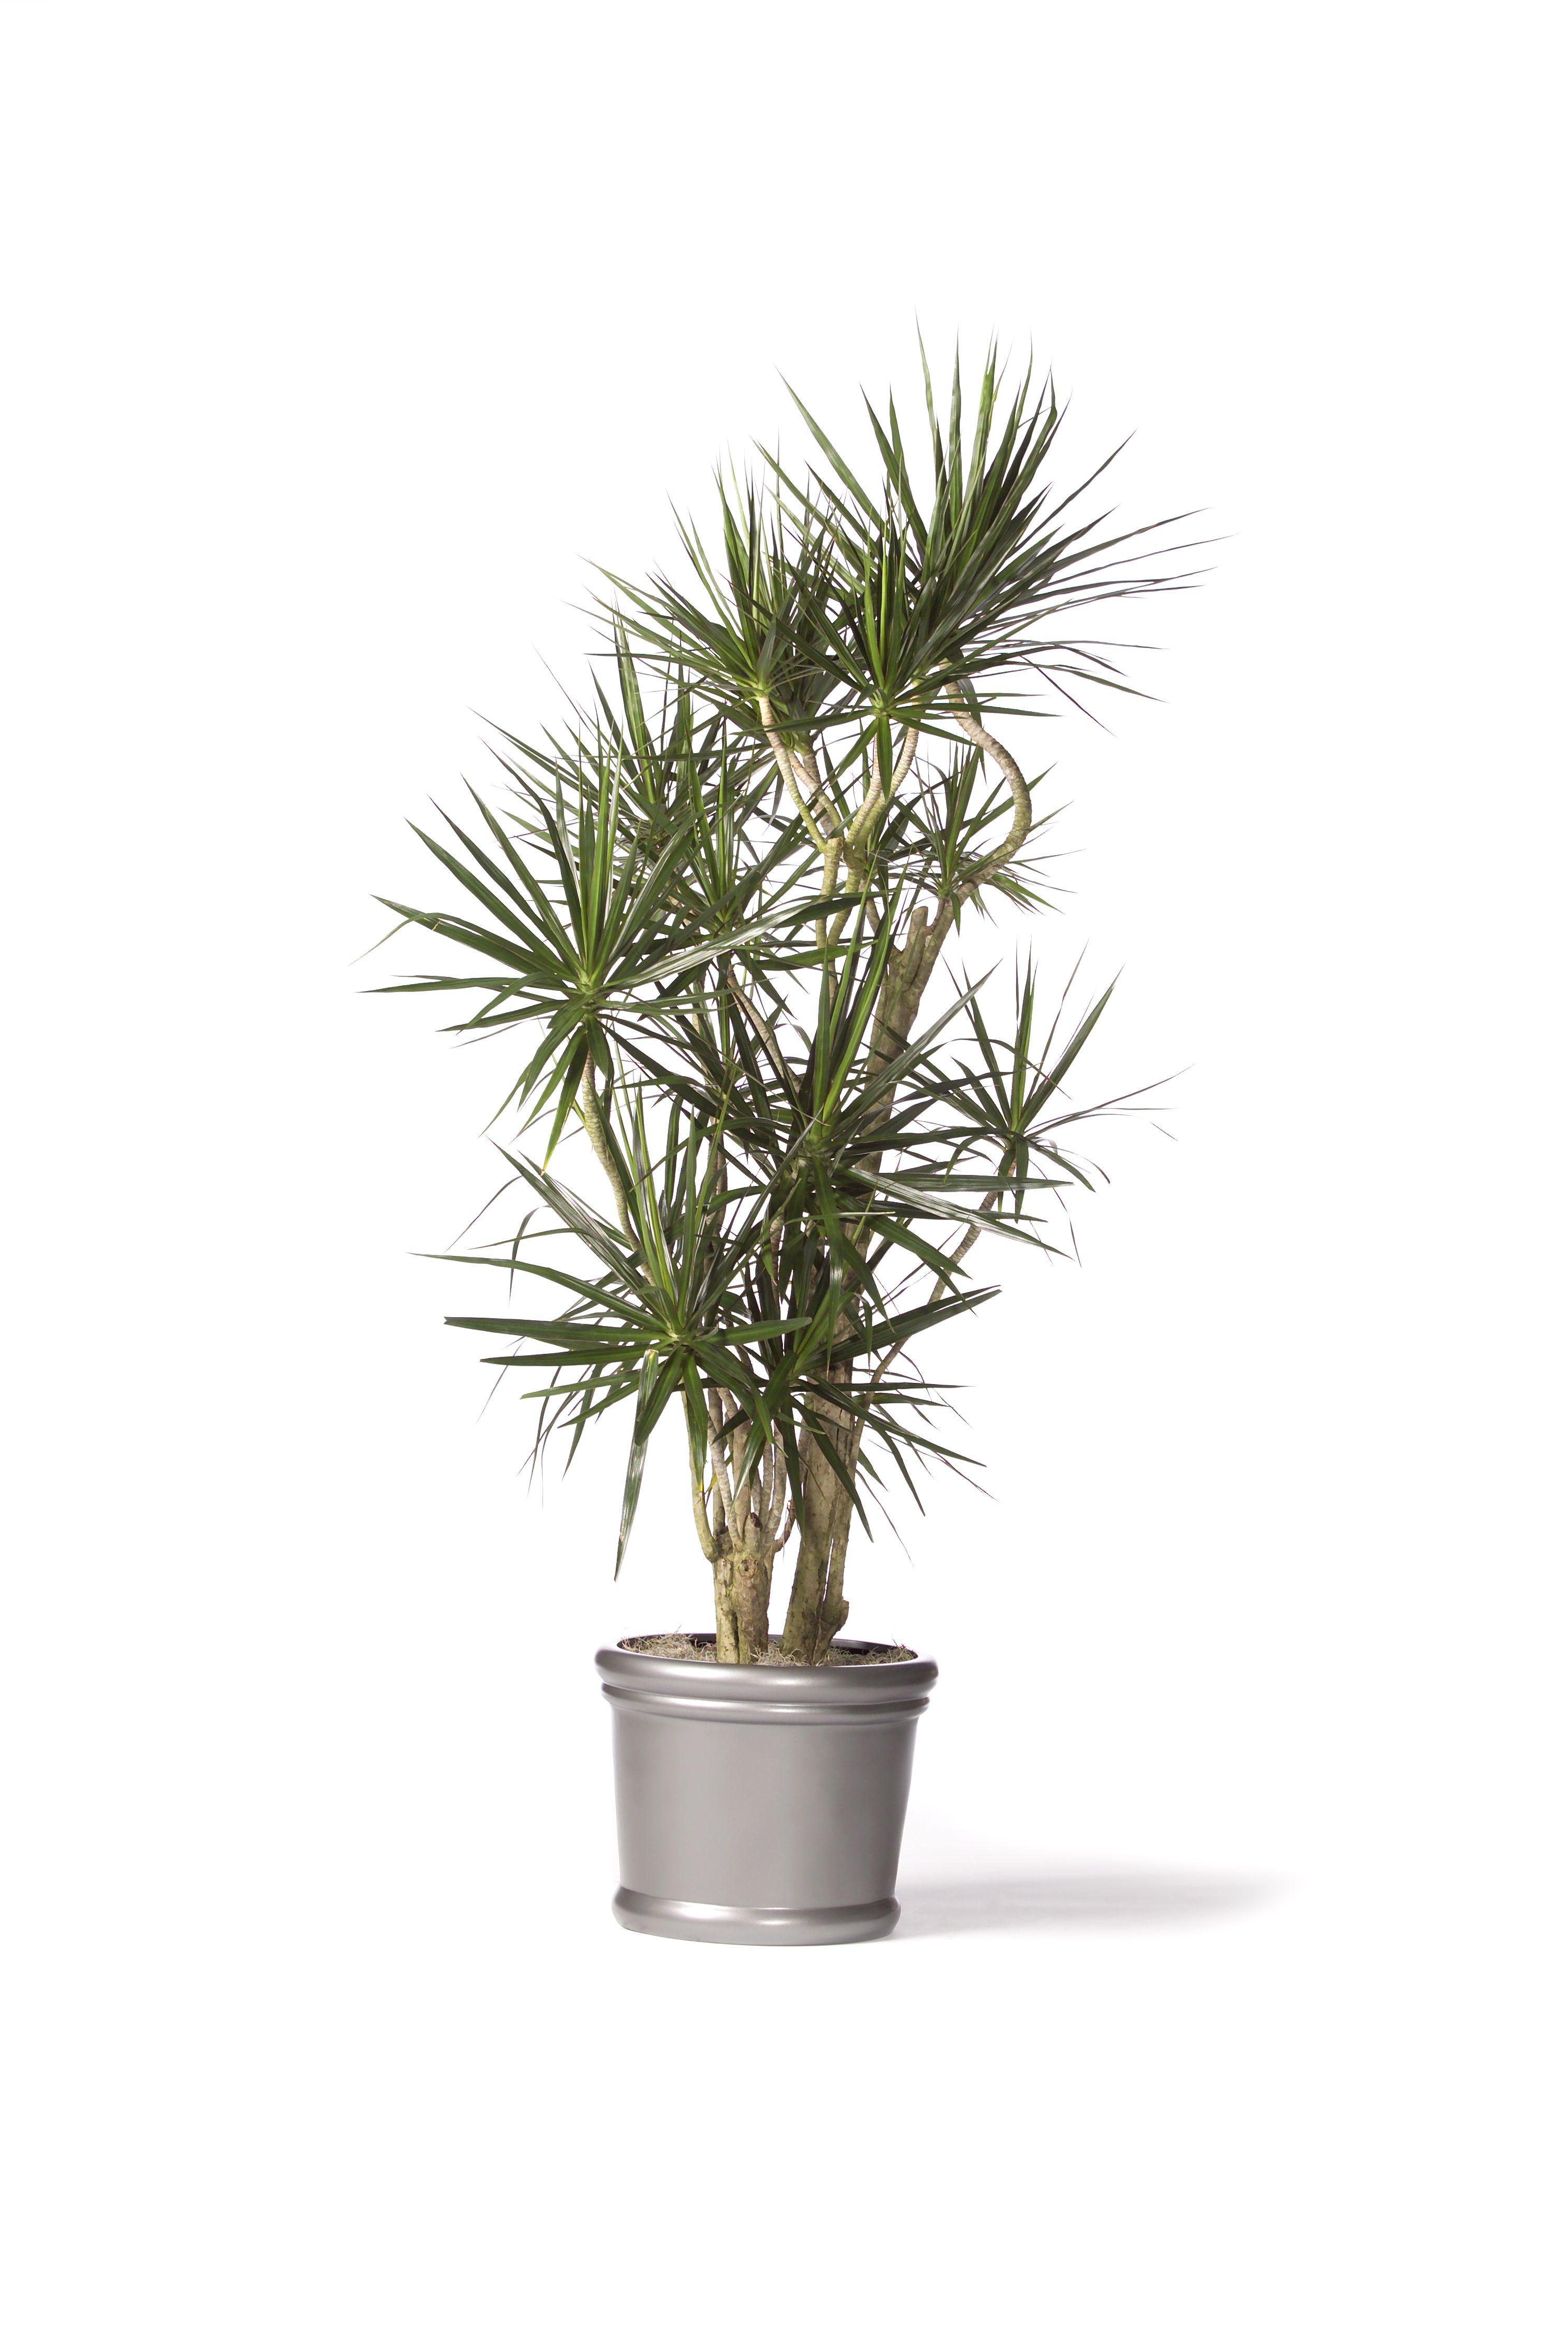 Dracaena marginata , red-edged dracaena | Top Houseplants ...